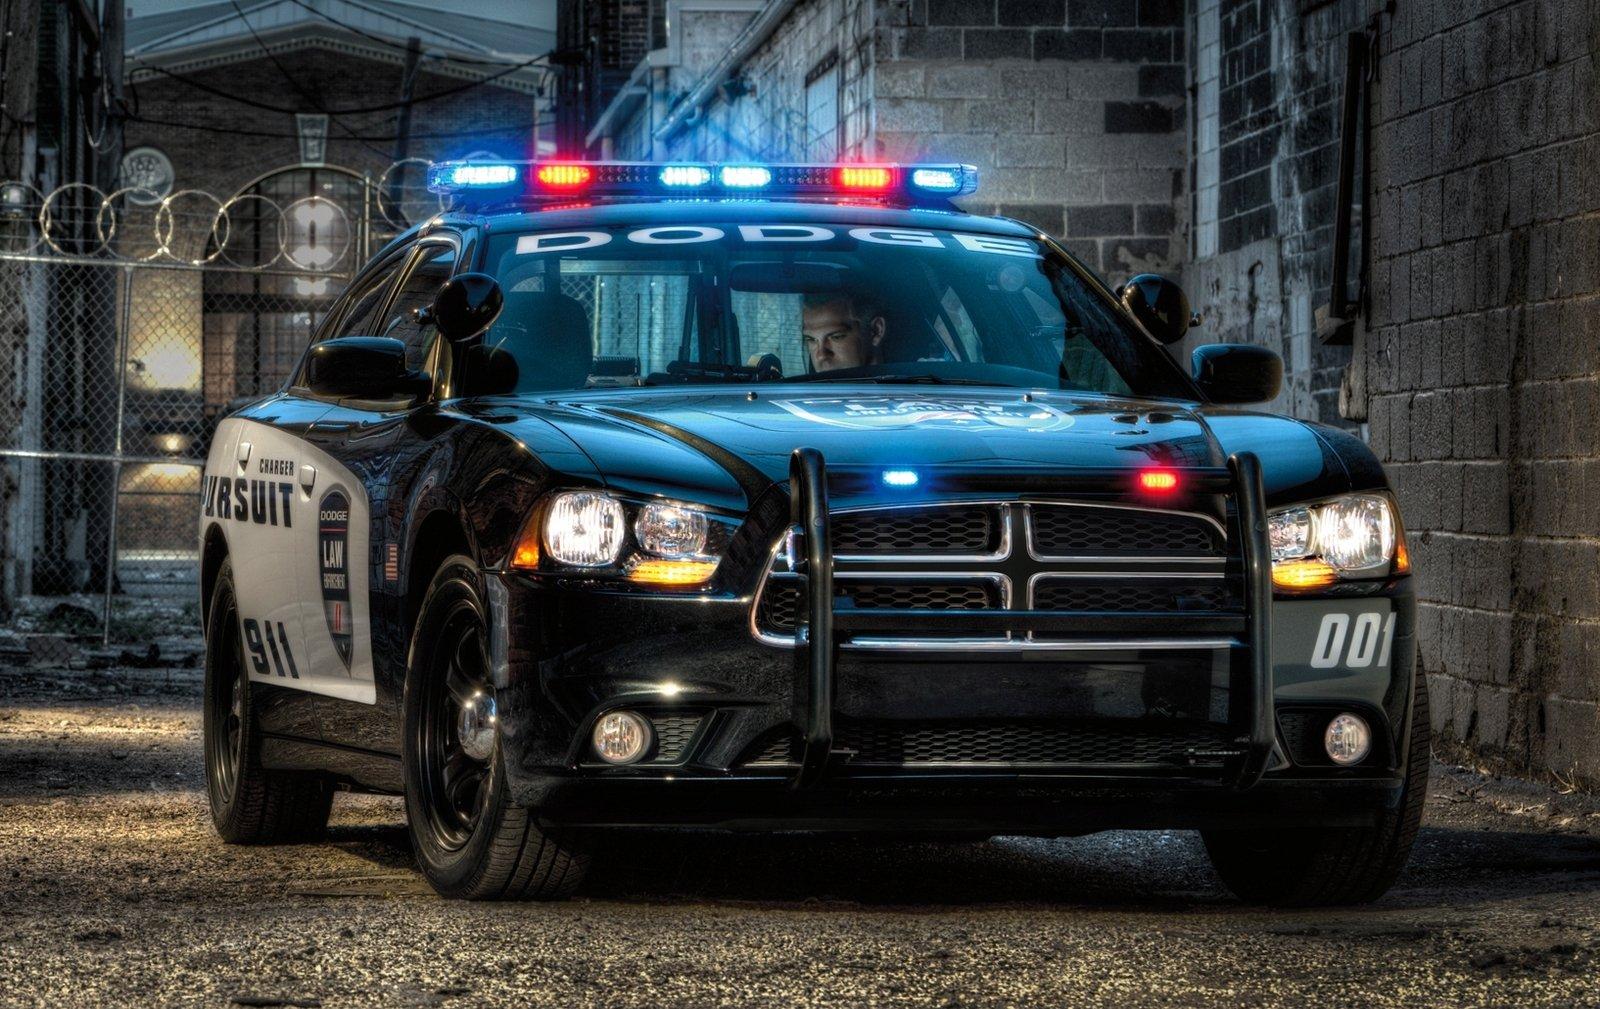 HQ 2014 Dodge Charger Pursuit  Wallpapers | File 359.8Kb